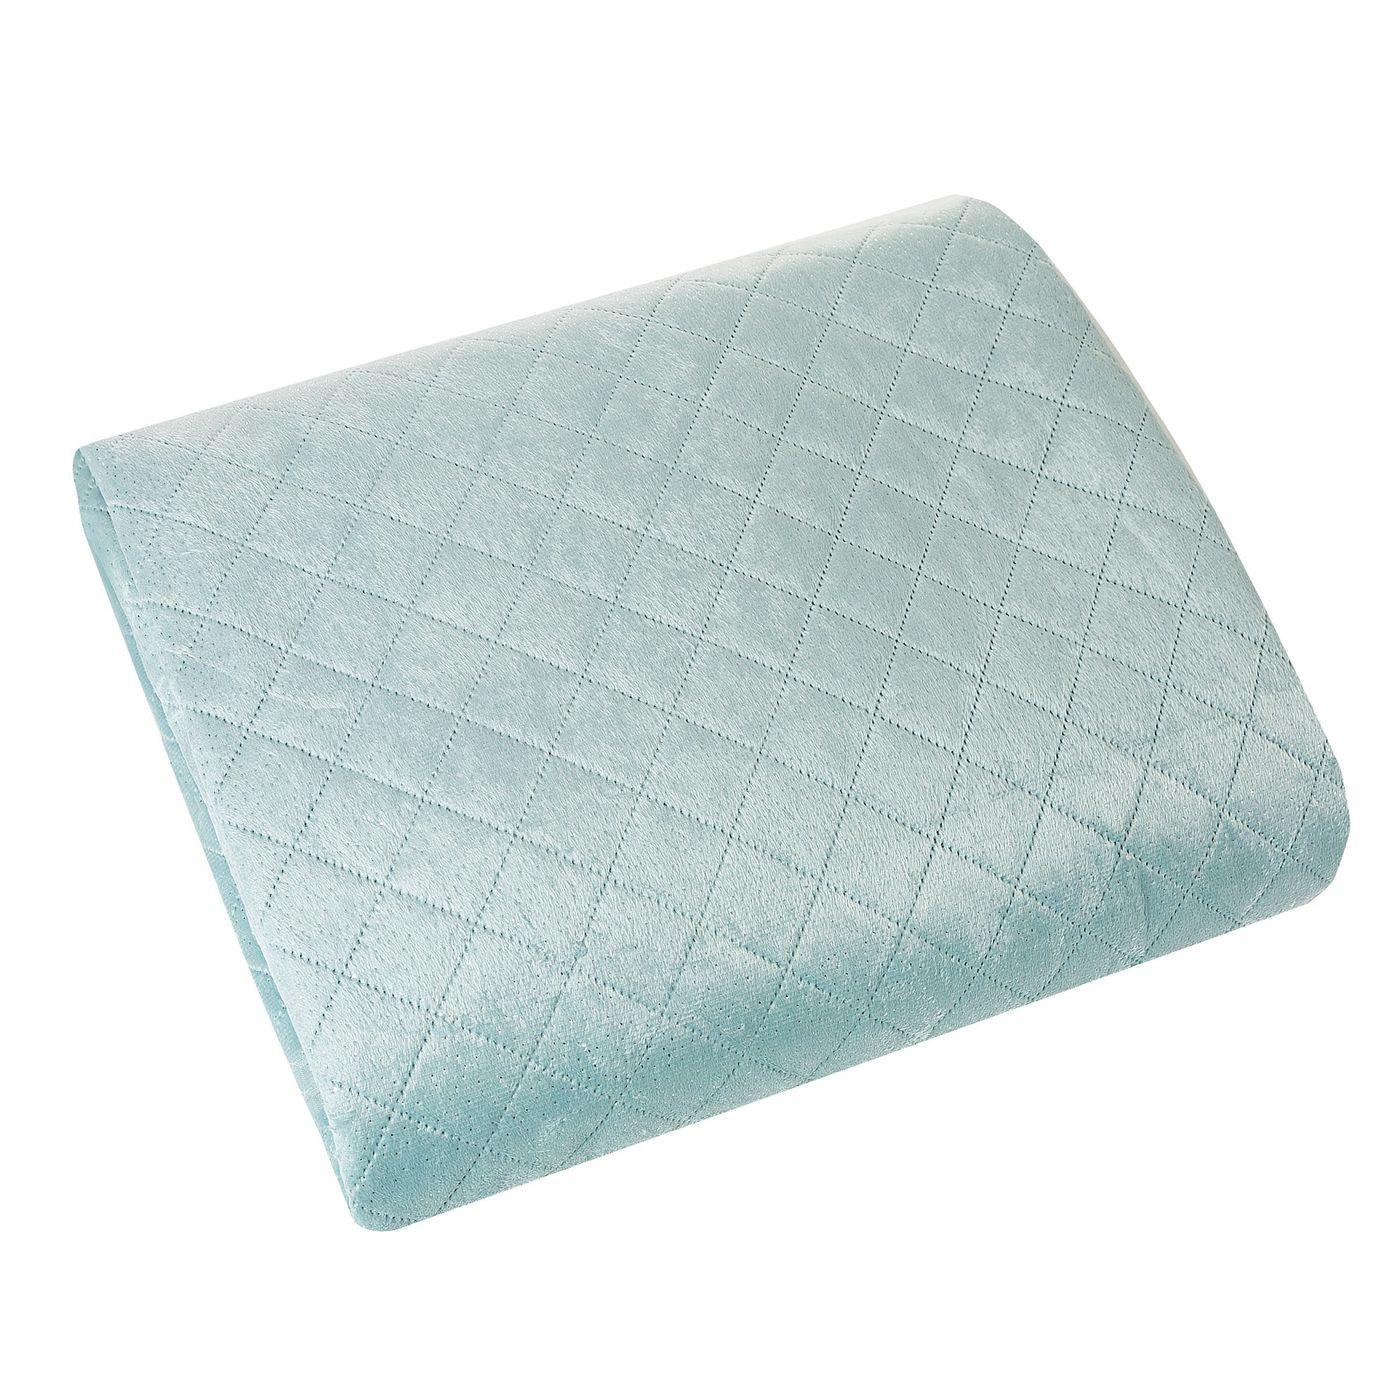 Narzuta na łóżko dwustronna pikowana hotpress 200x220 cm